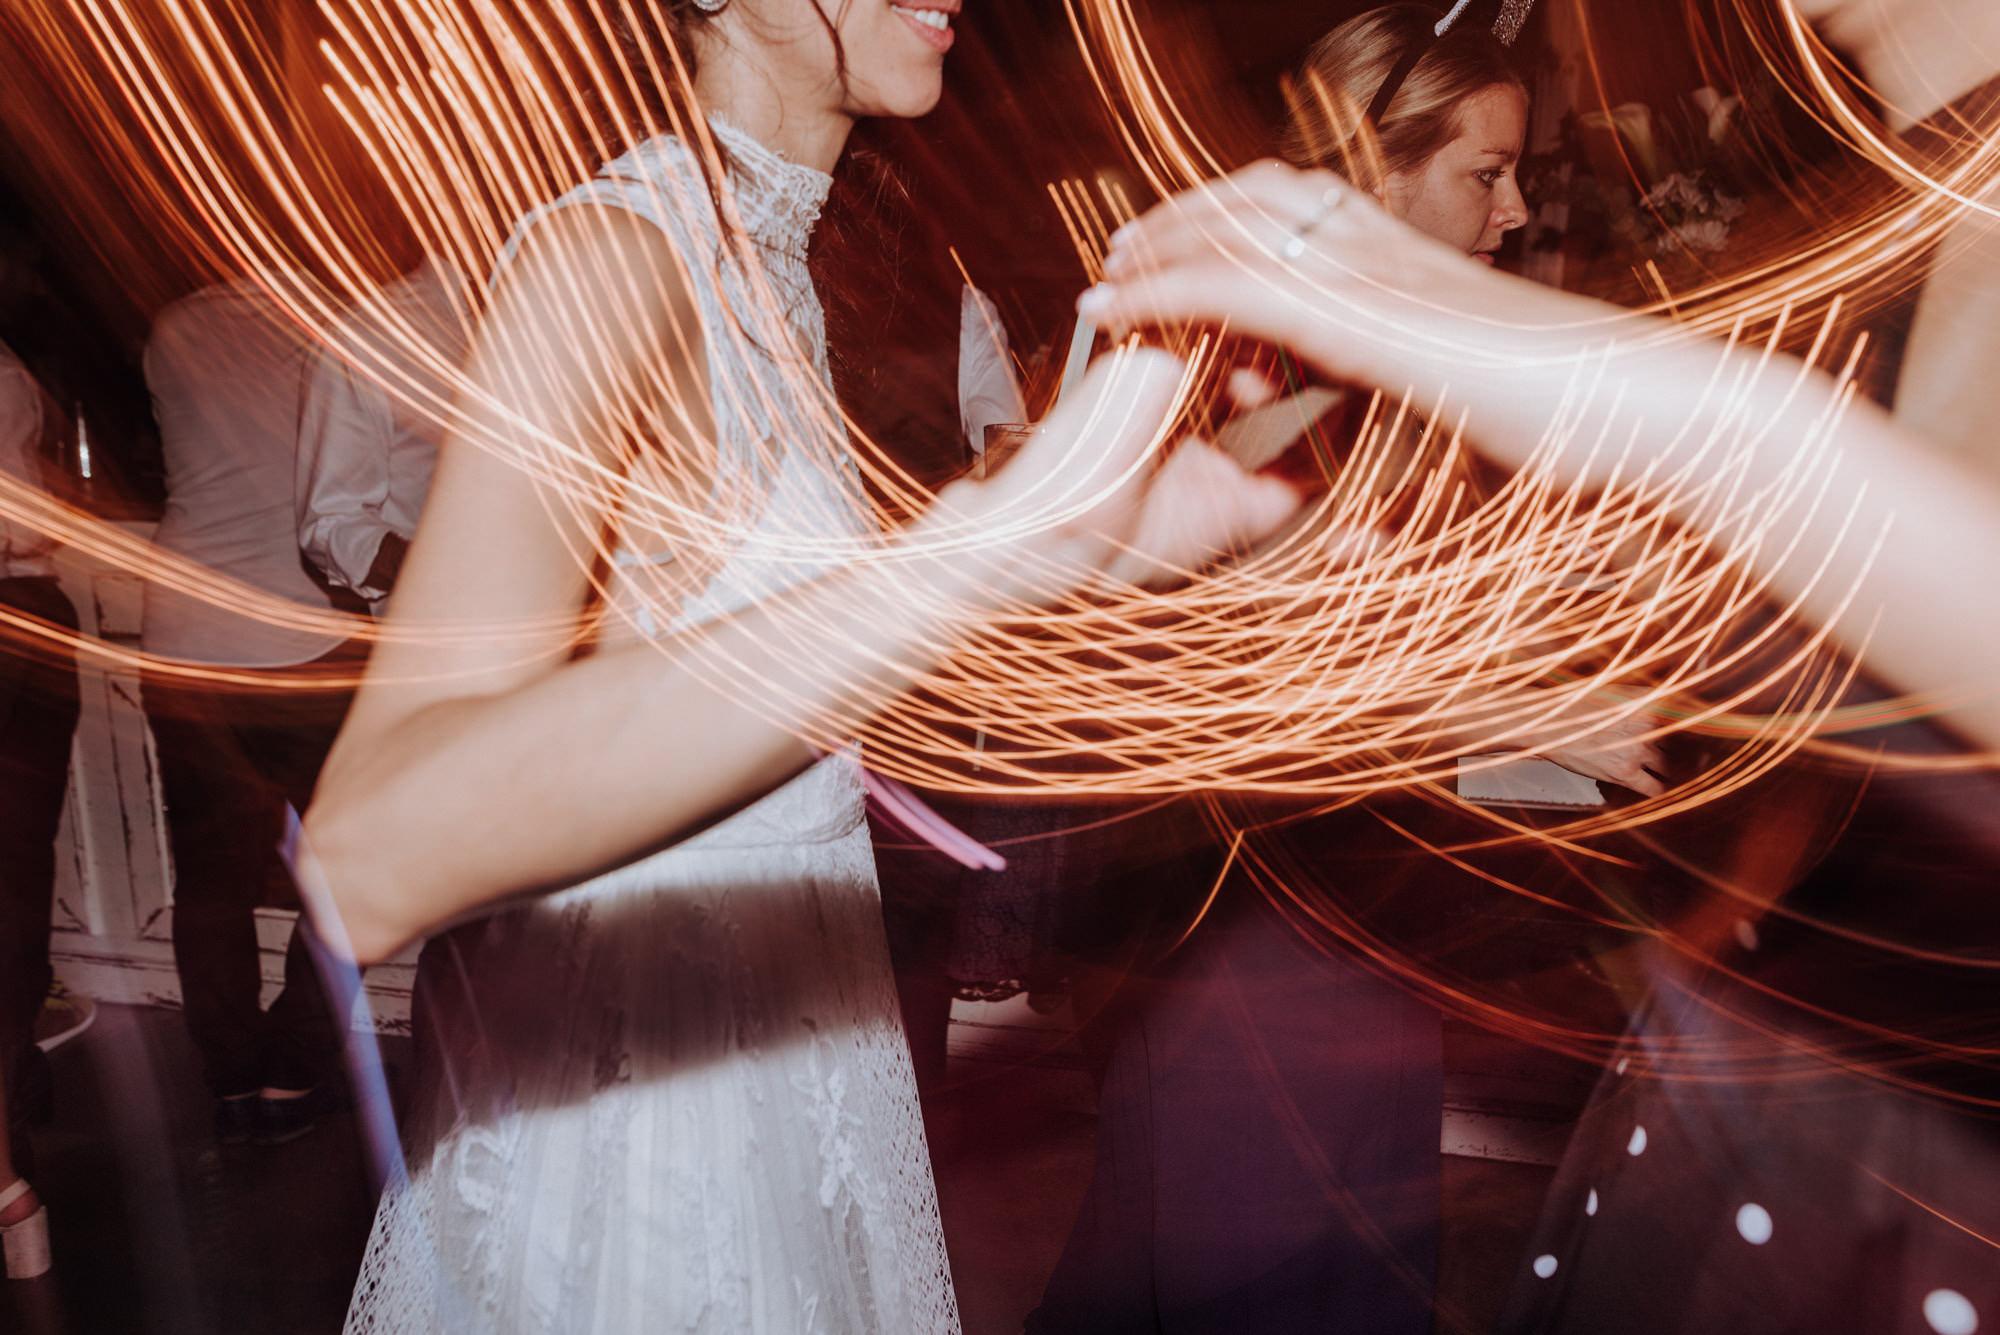 FOTO+PHOTO+BODA+WEDDING+ITALIA+ITALY+MAURICIO+GARAY+MAURICIOGARAY+WEDDINPHOTOGRAPHER+FOTOGRAFODEBODA-2209.jpg